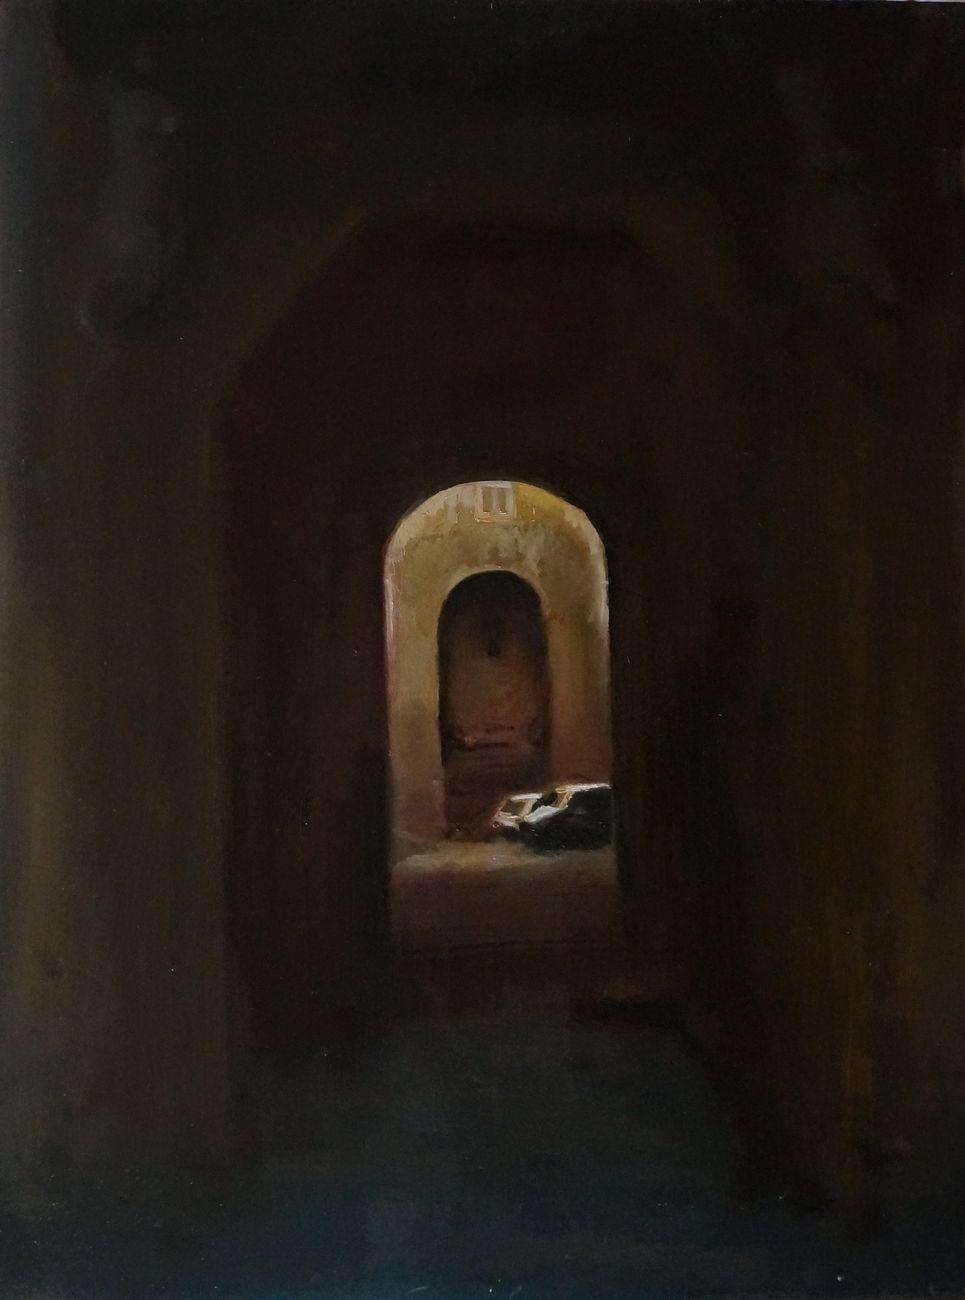 Paolo La Motta, Sanfelice e l'impluvium, 2019, olio su tavola, cm 80x60